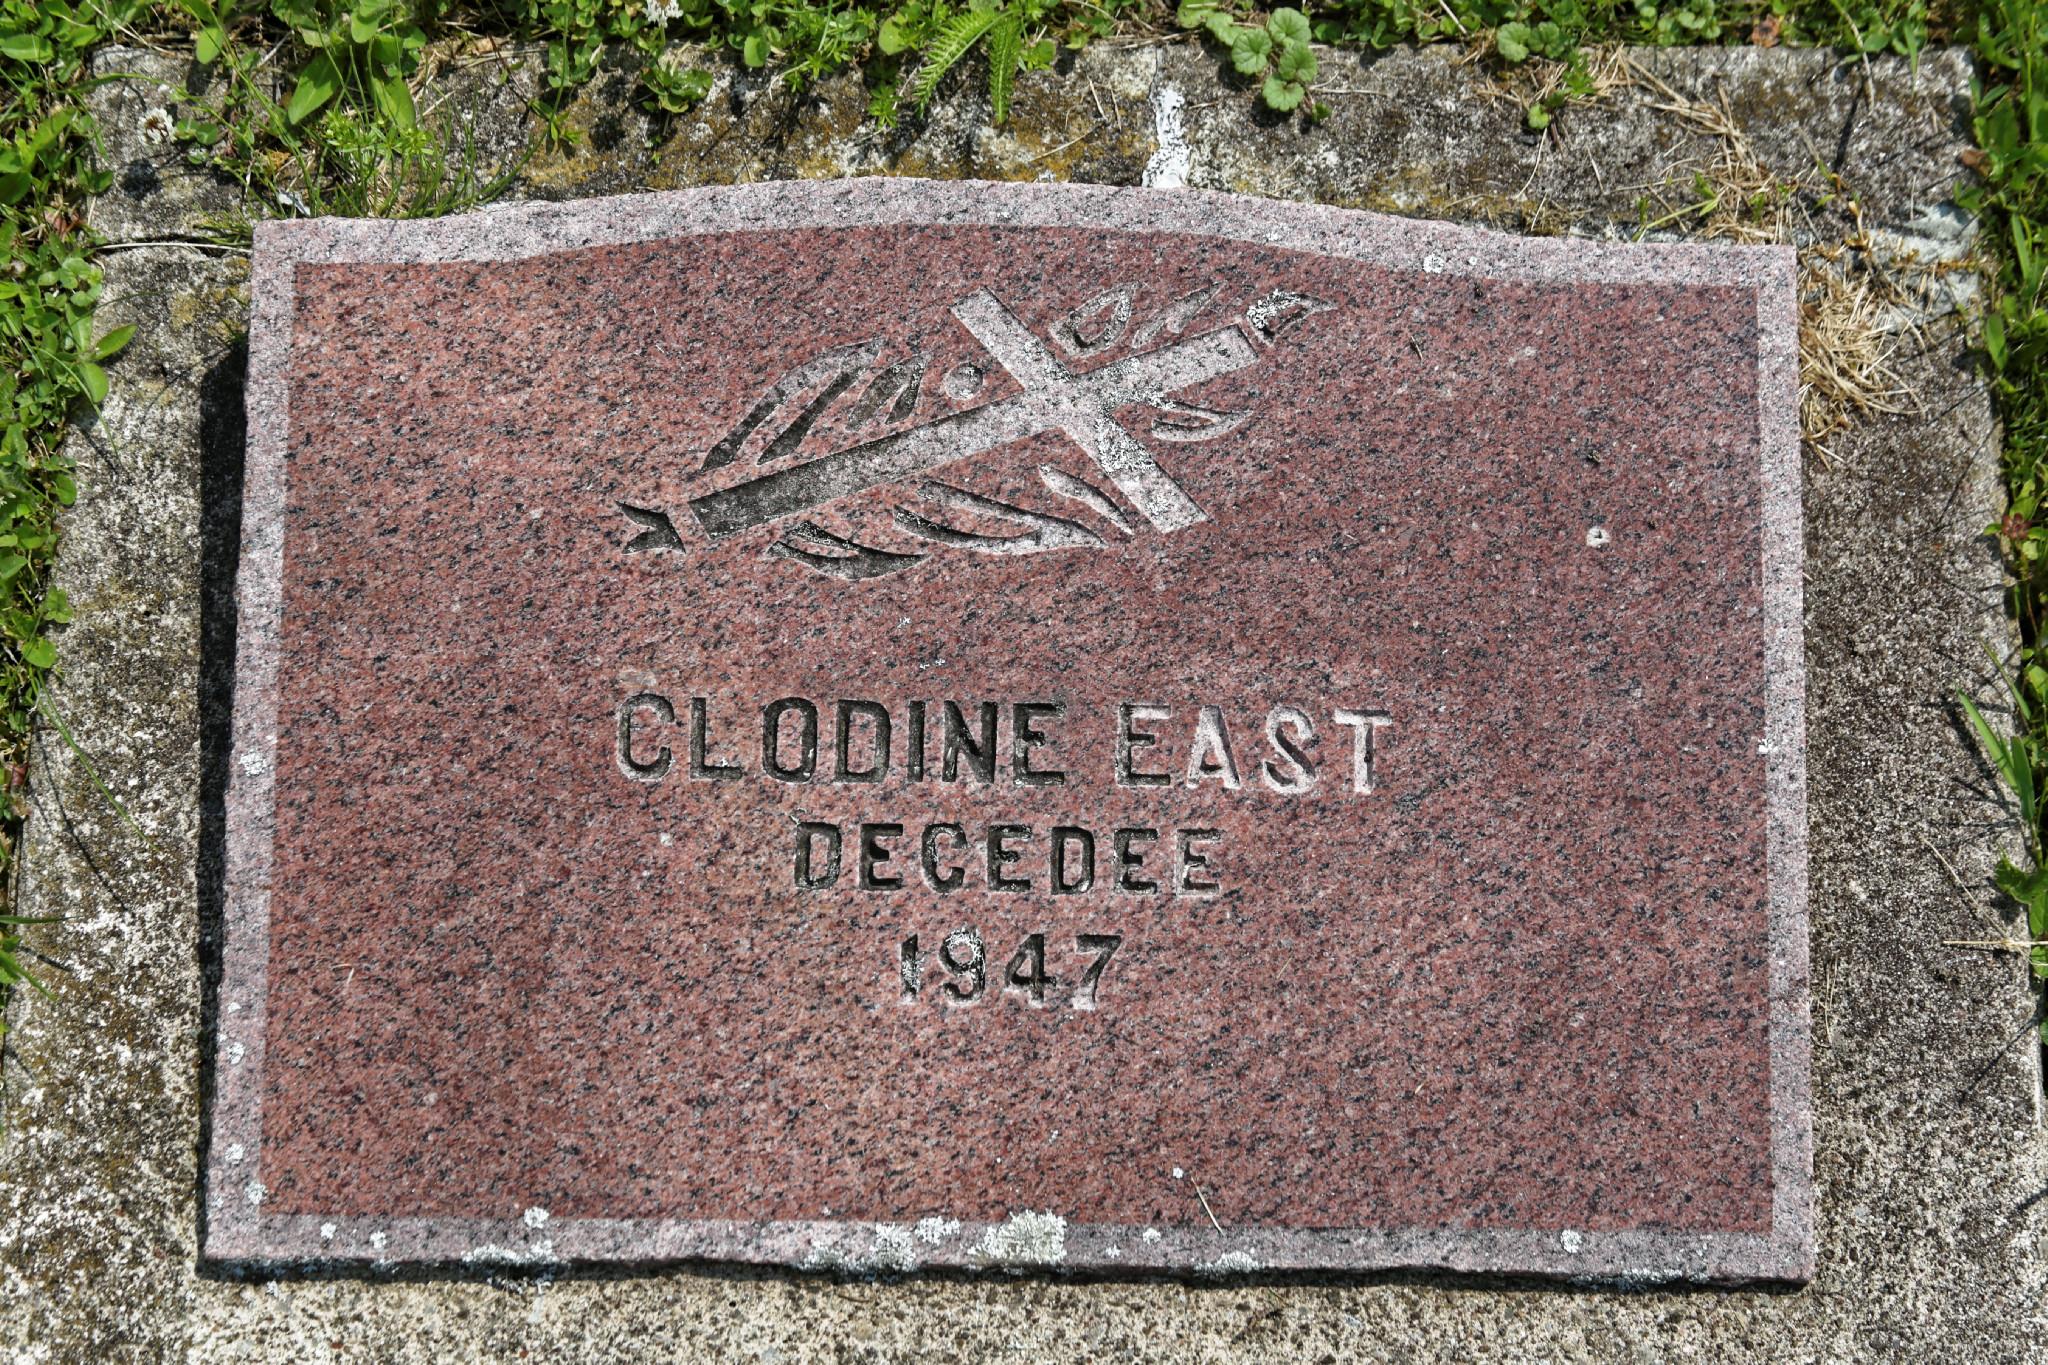 Clodine East